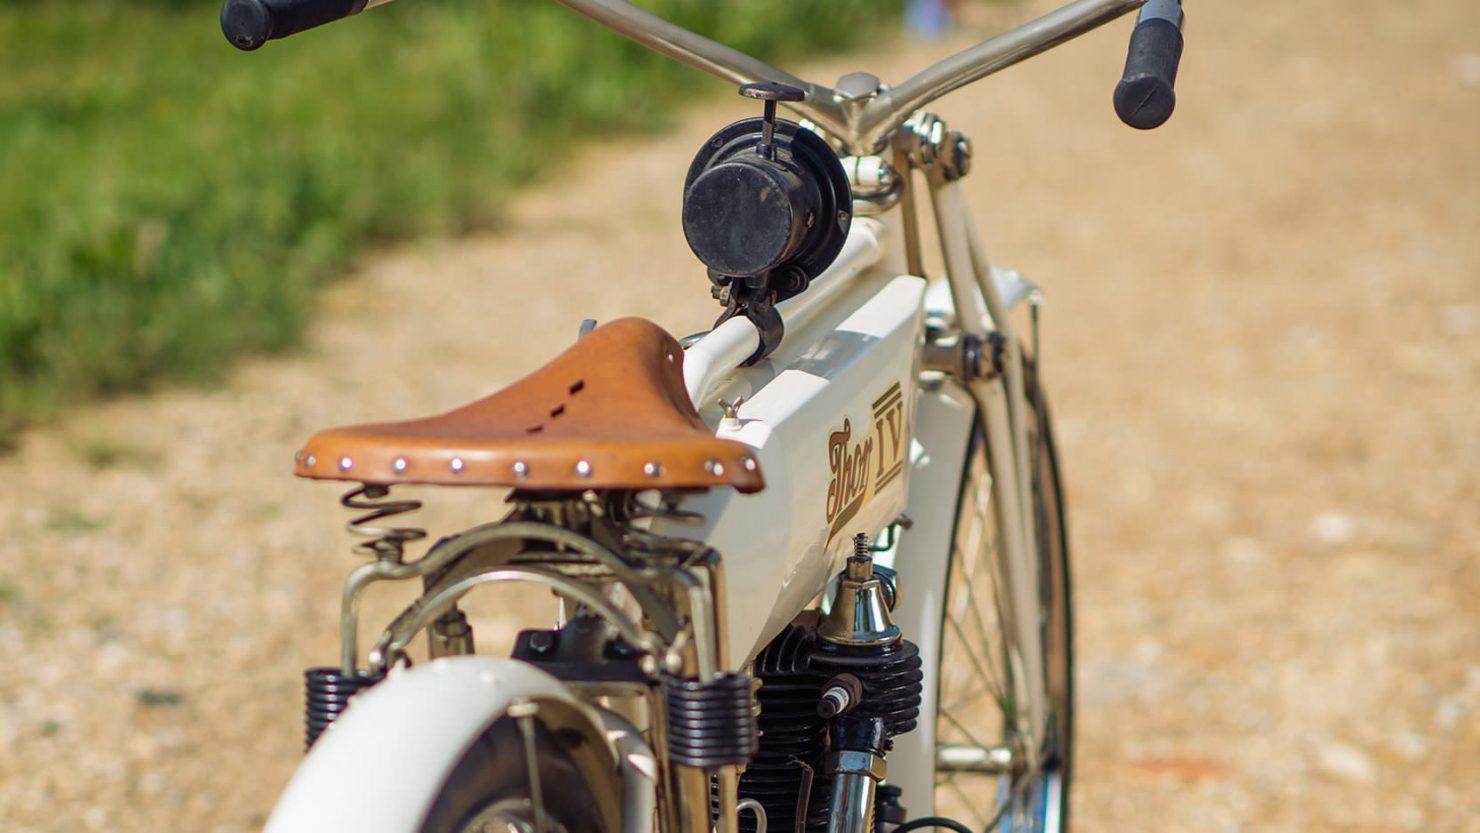 Thor Single Motorcycle 6 1480x833 - 1910 Thor Single